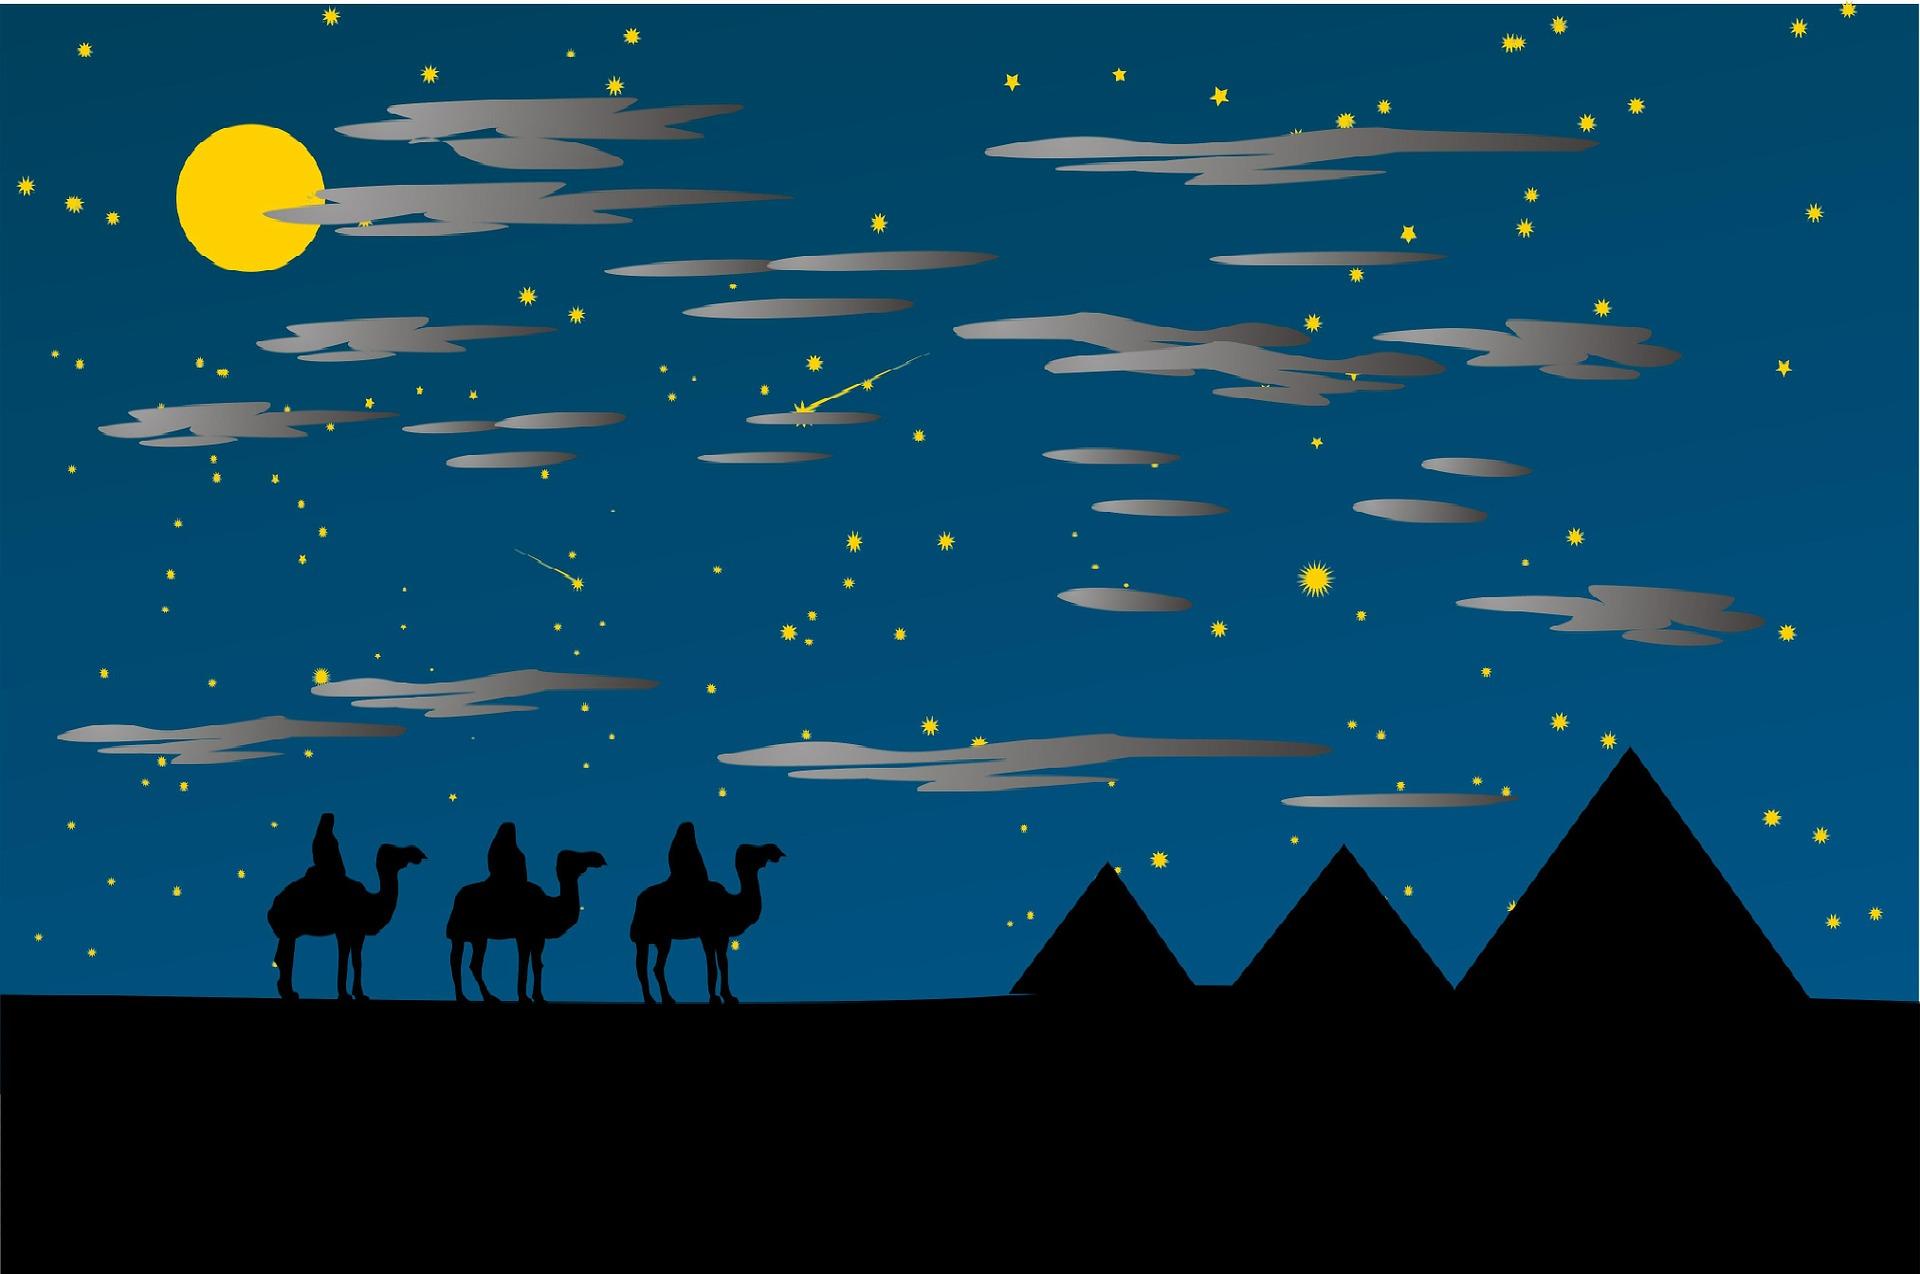 9 Travel Christmas Quotes to Make Your Journey Joyful